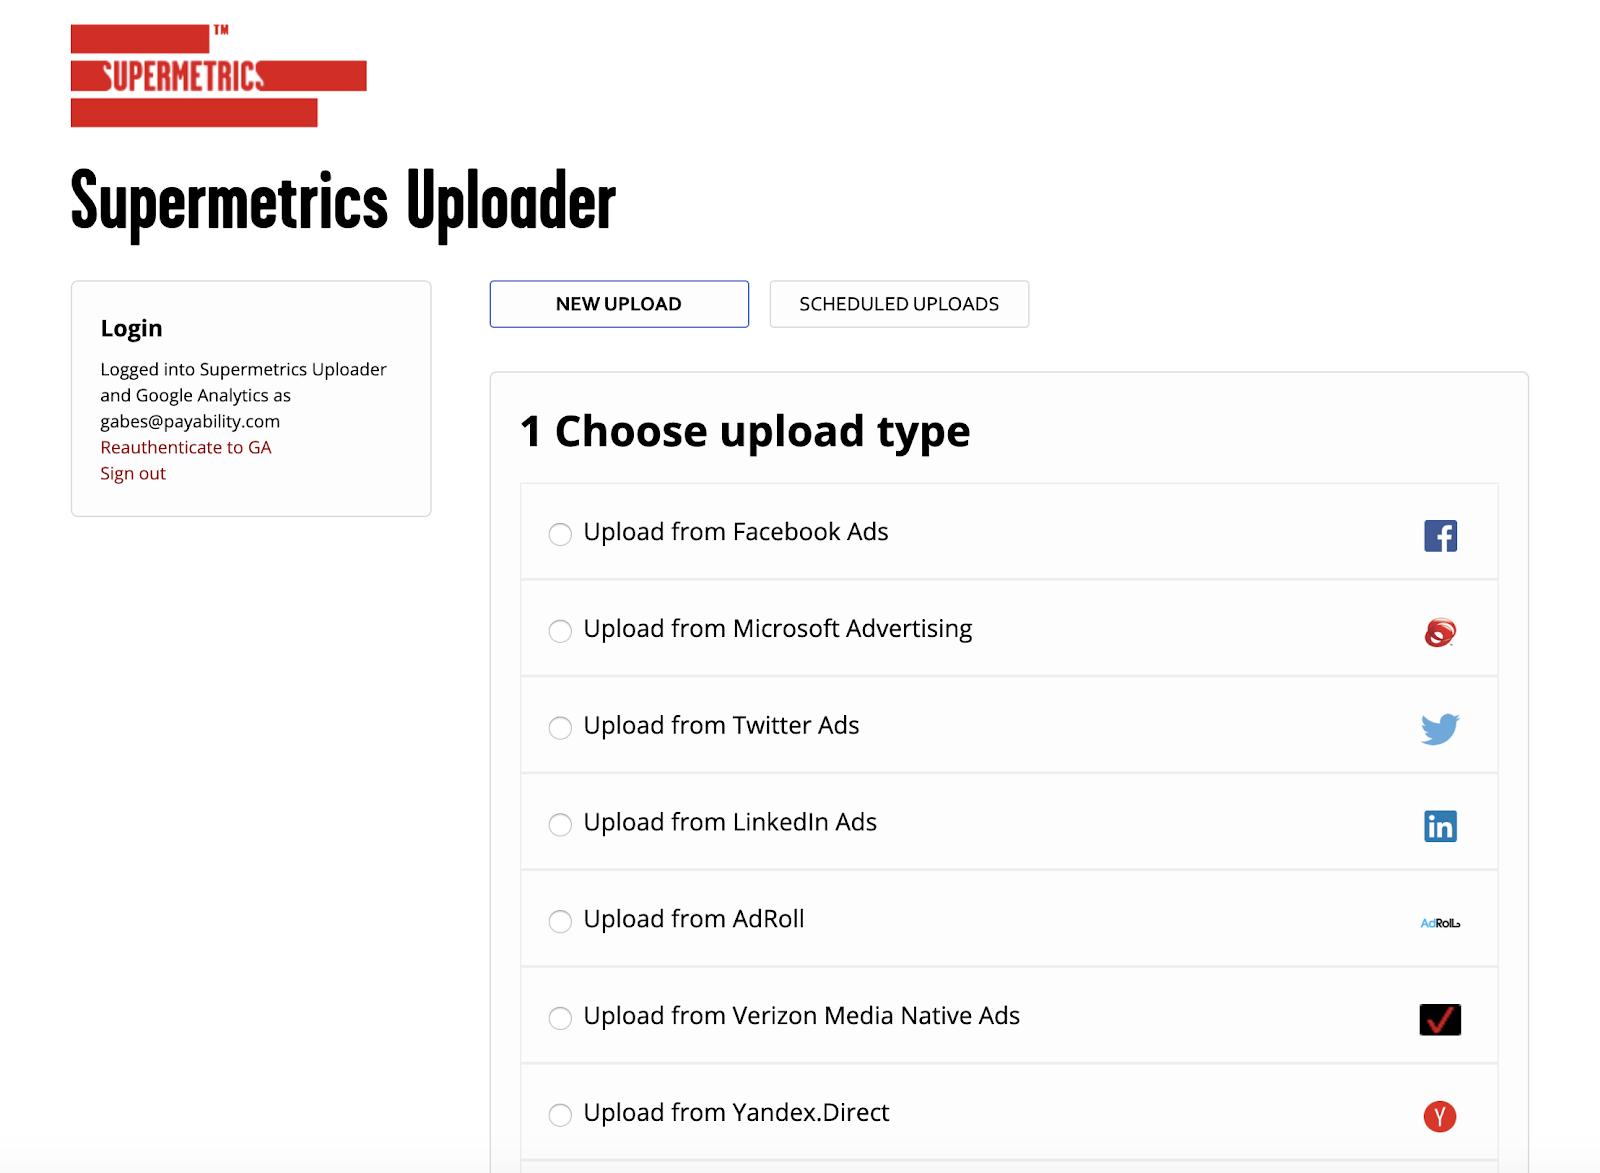 Supermetrics Uploader - Choose upload type